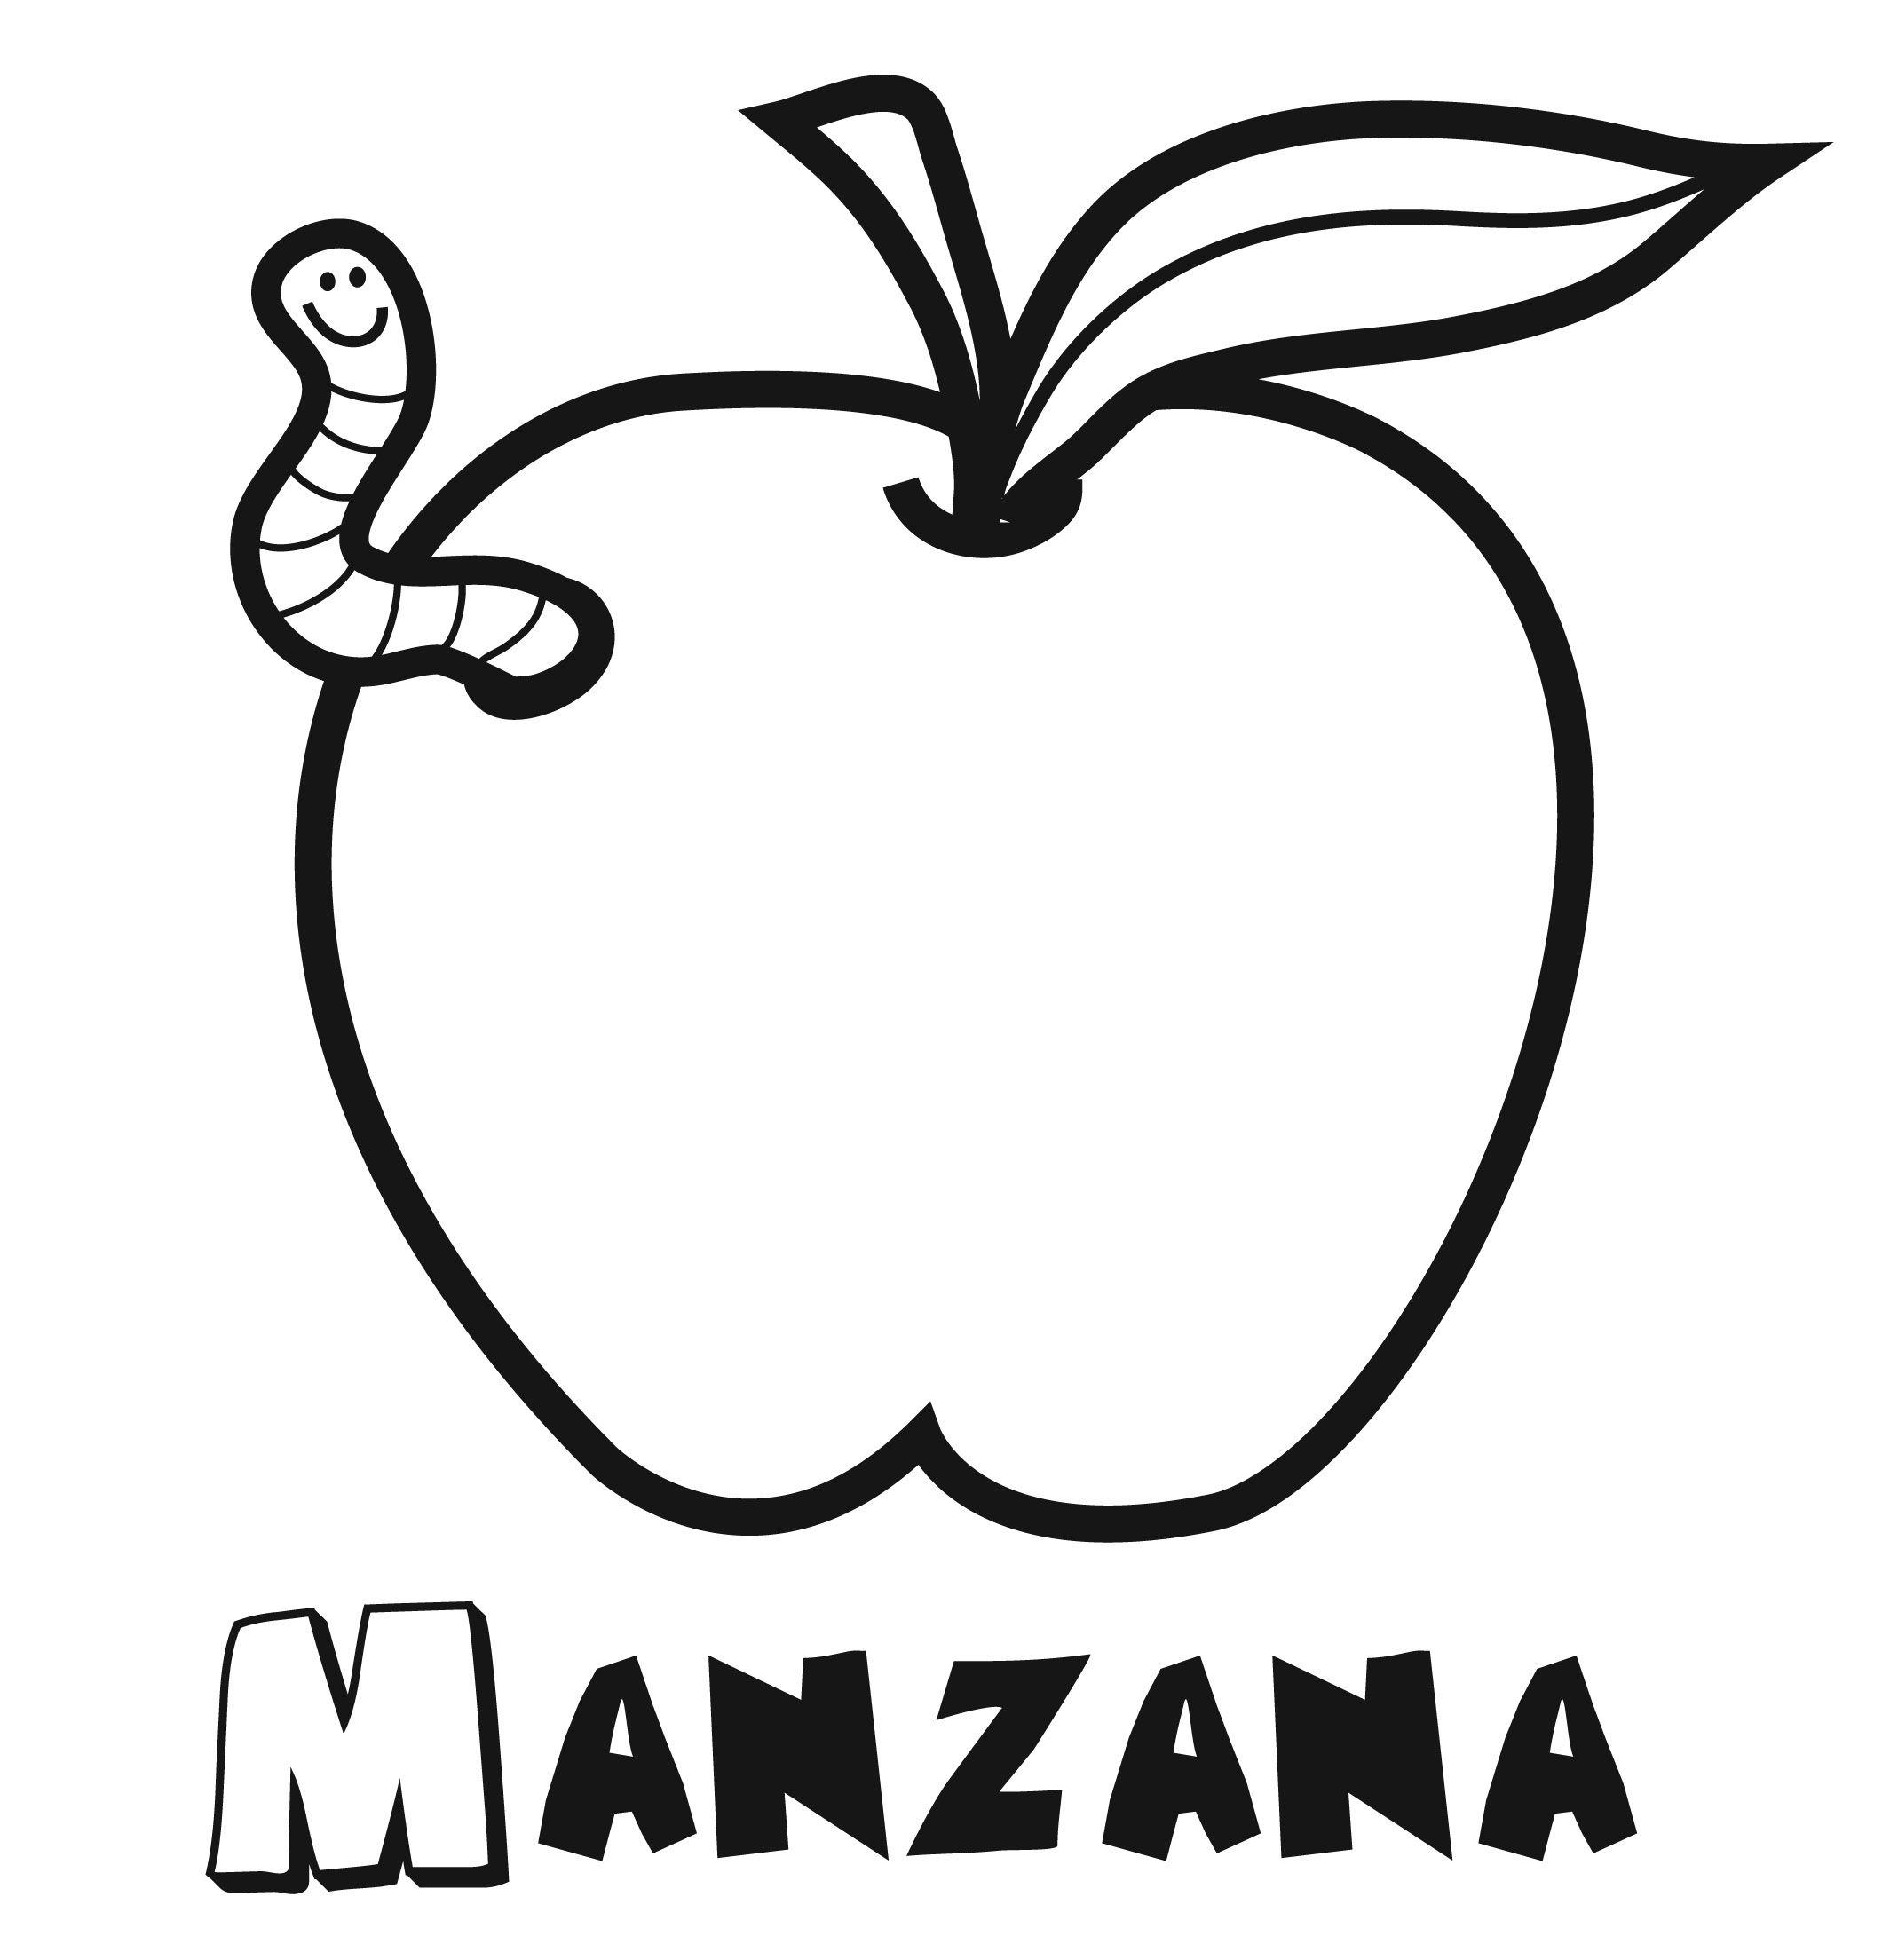 manzana-para-colorear-3.jpg (2129×2208) | Teaching | Pinterest